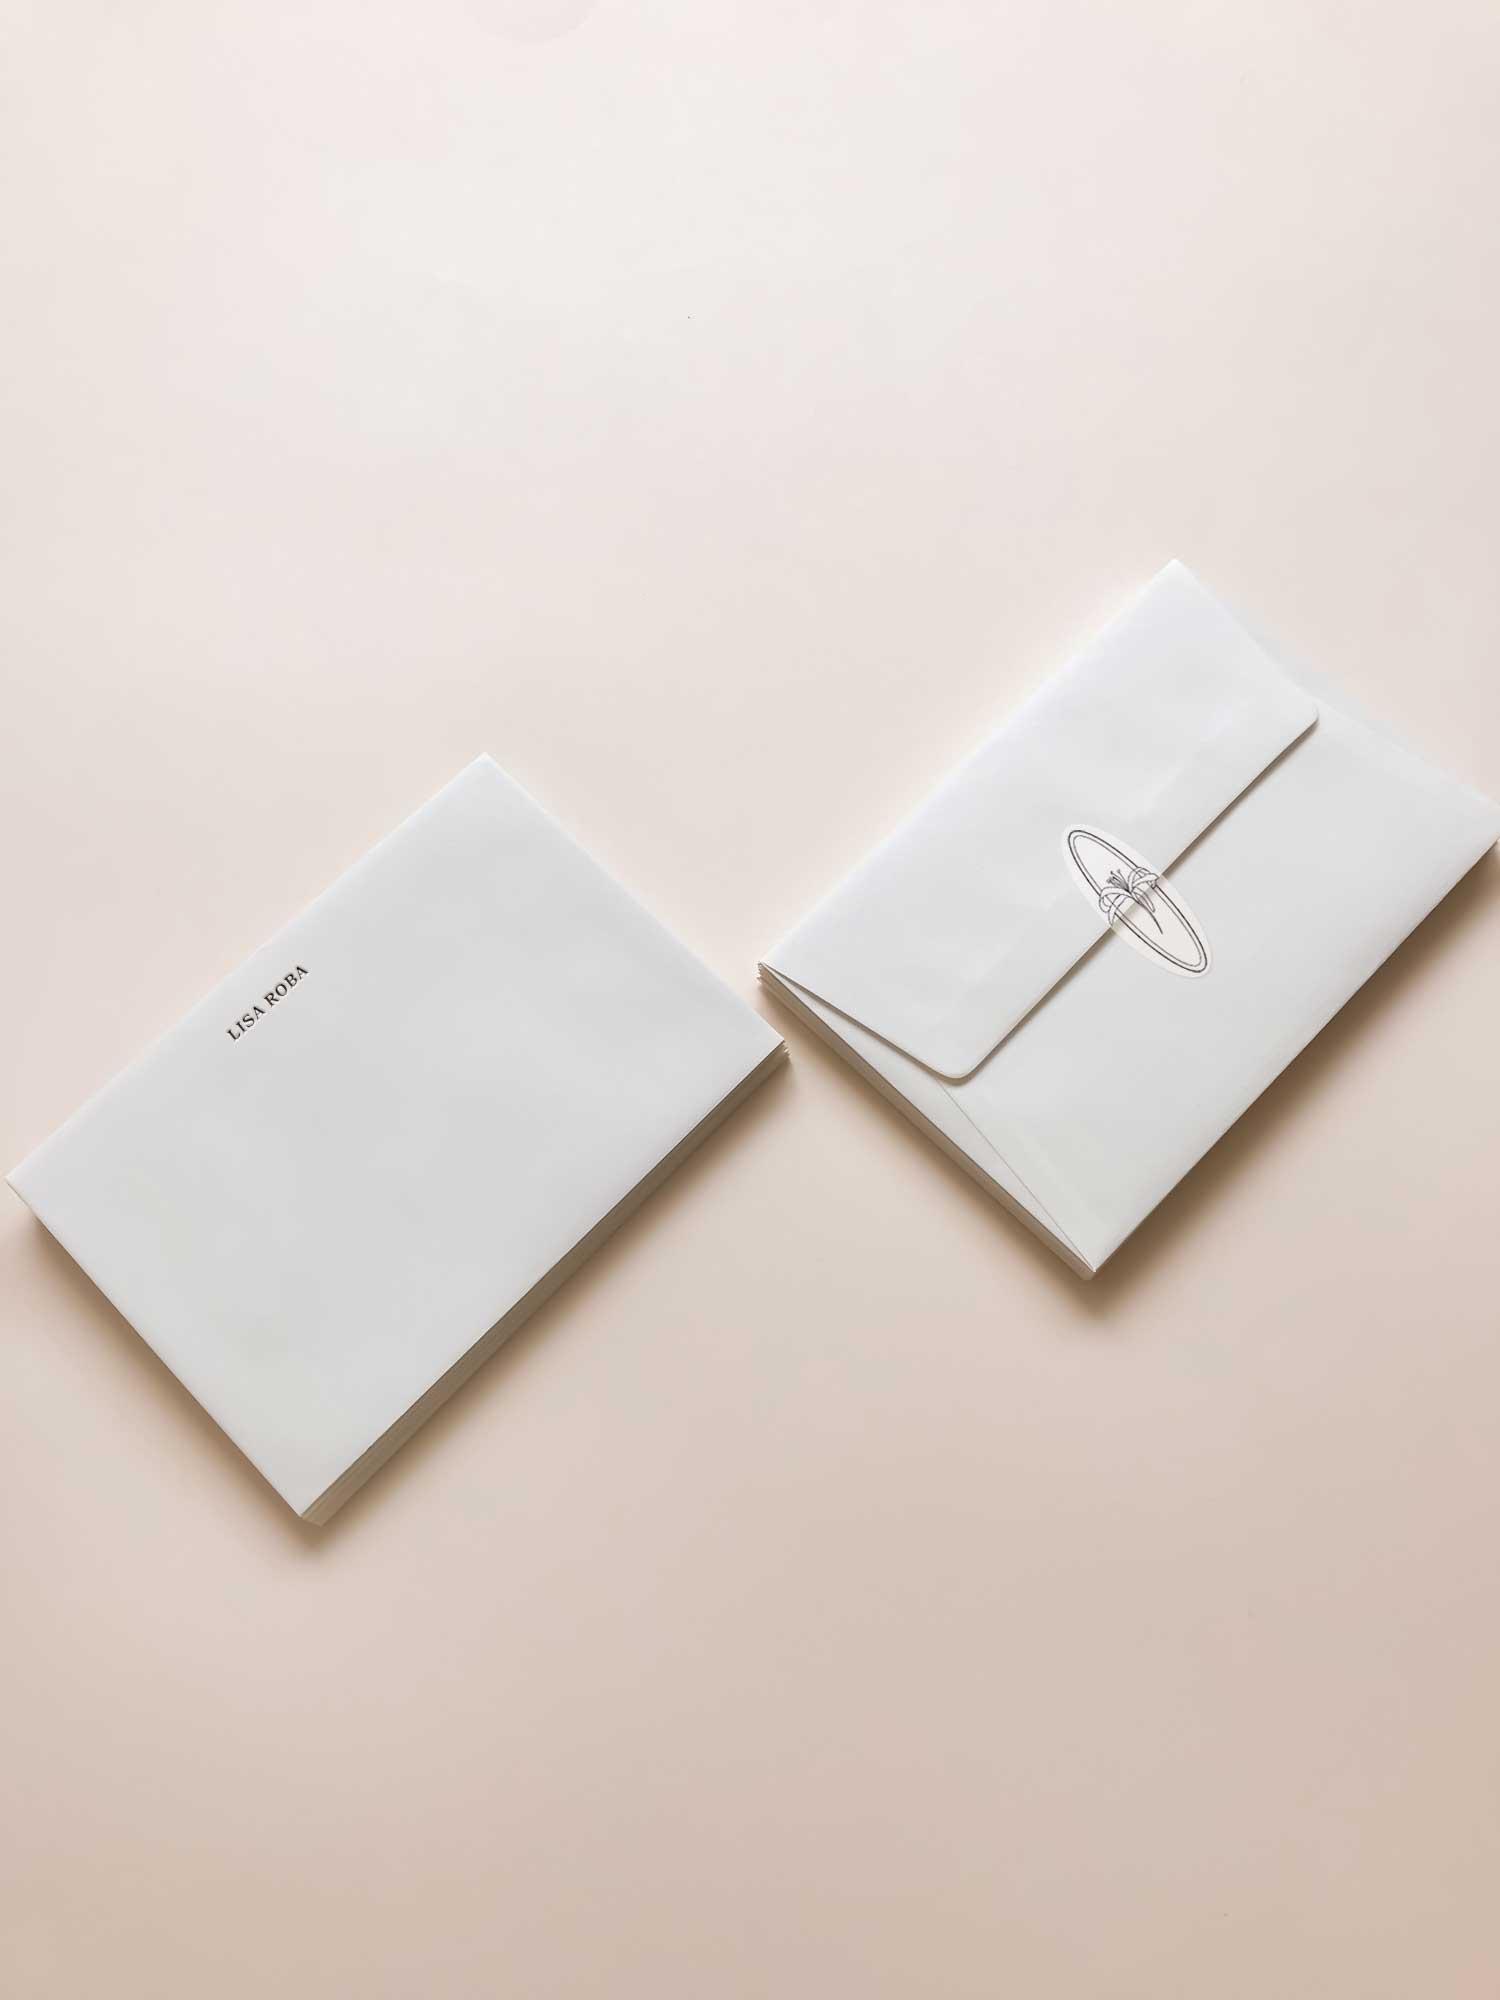 lisa-roba-logo-design-envelopes-loolaadesigns.jpg